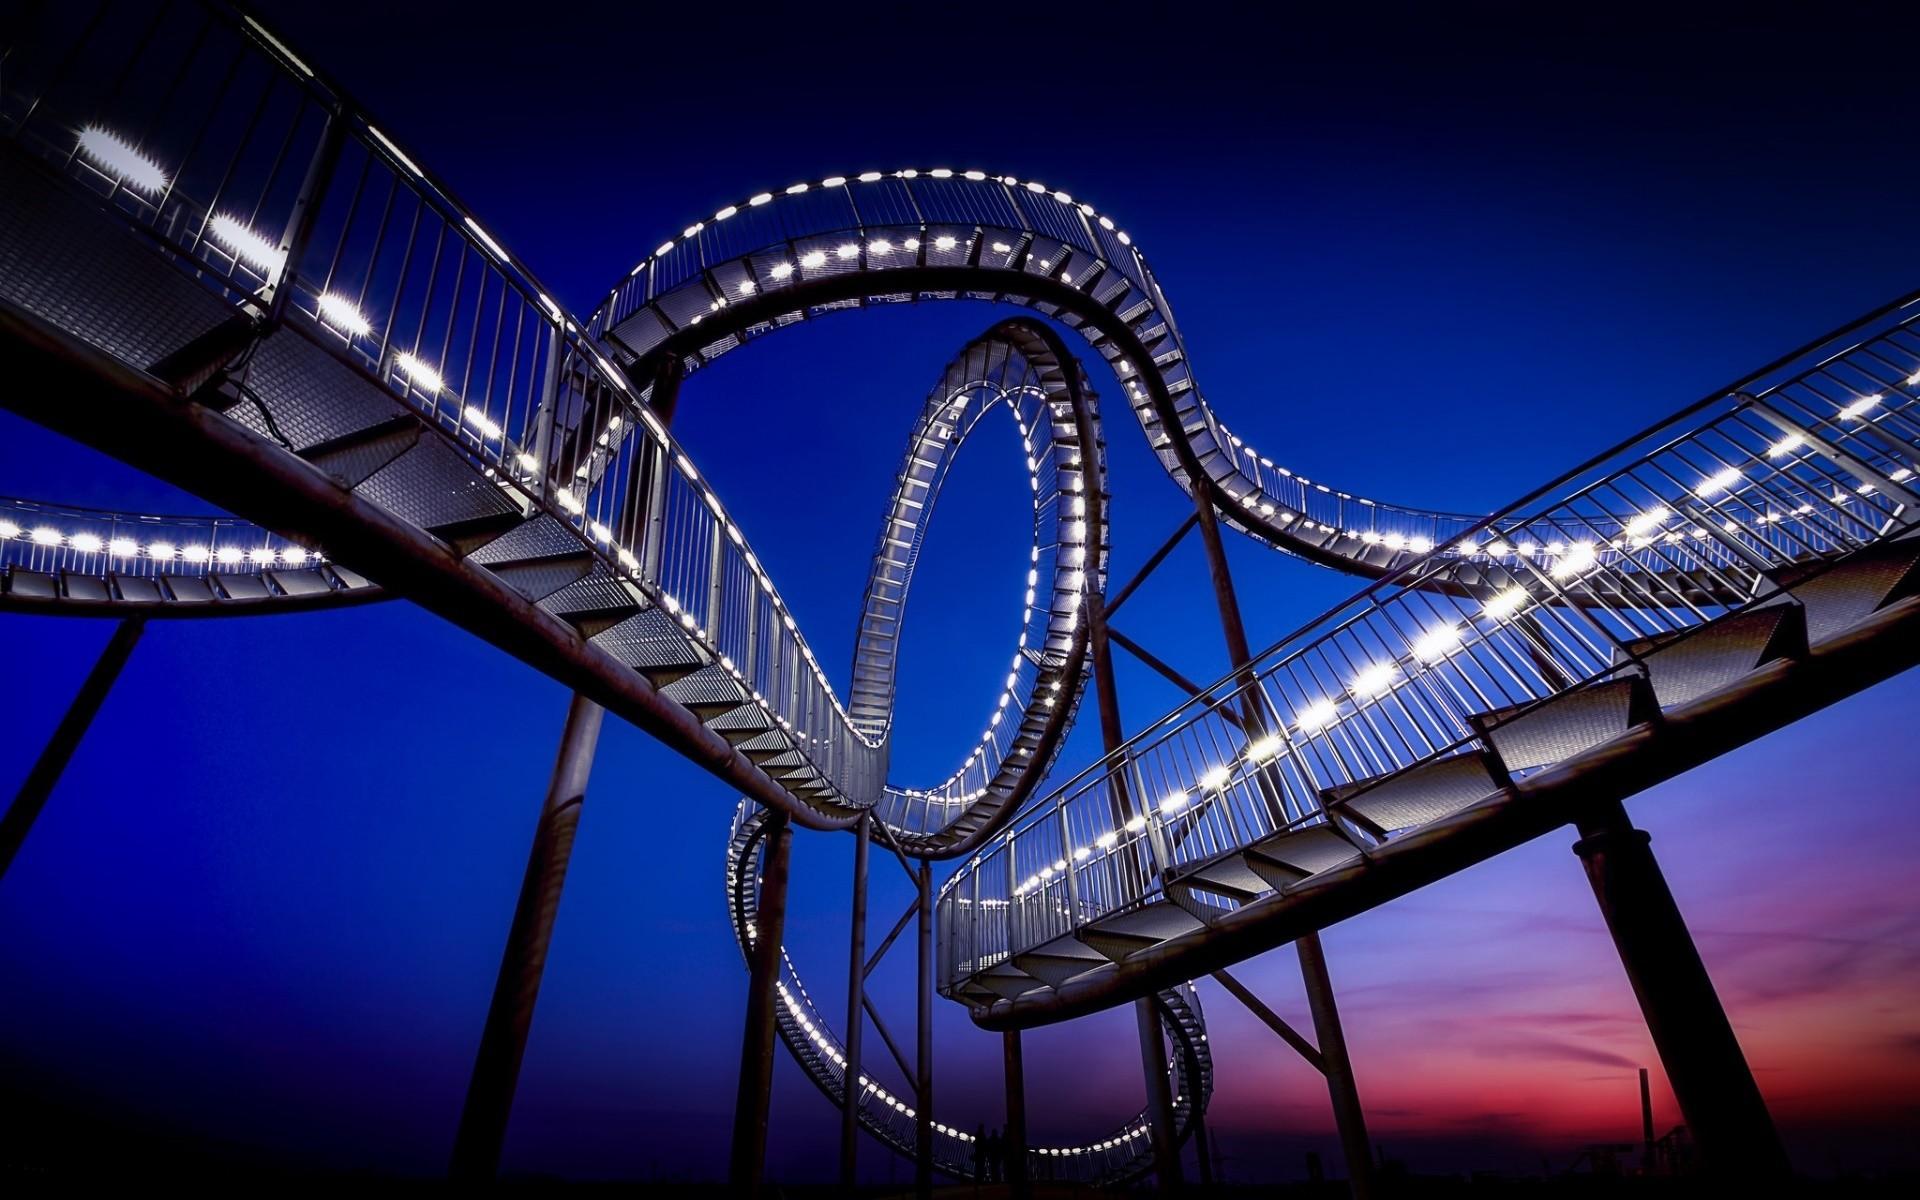 Обои Rollercoaster ride, ночь. Города foto 7